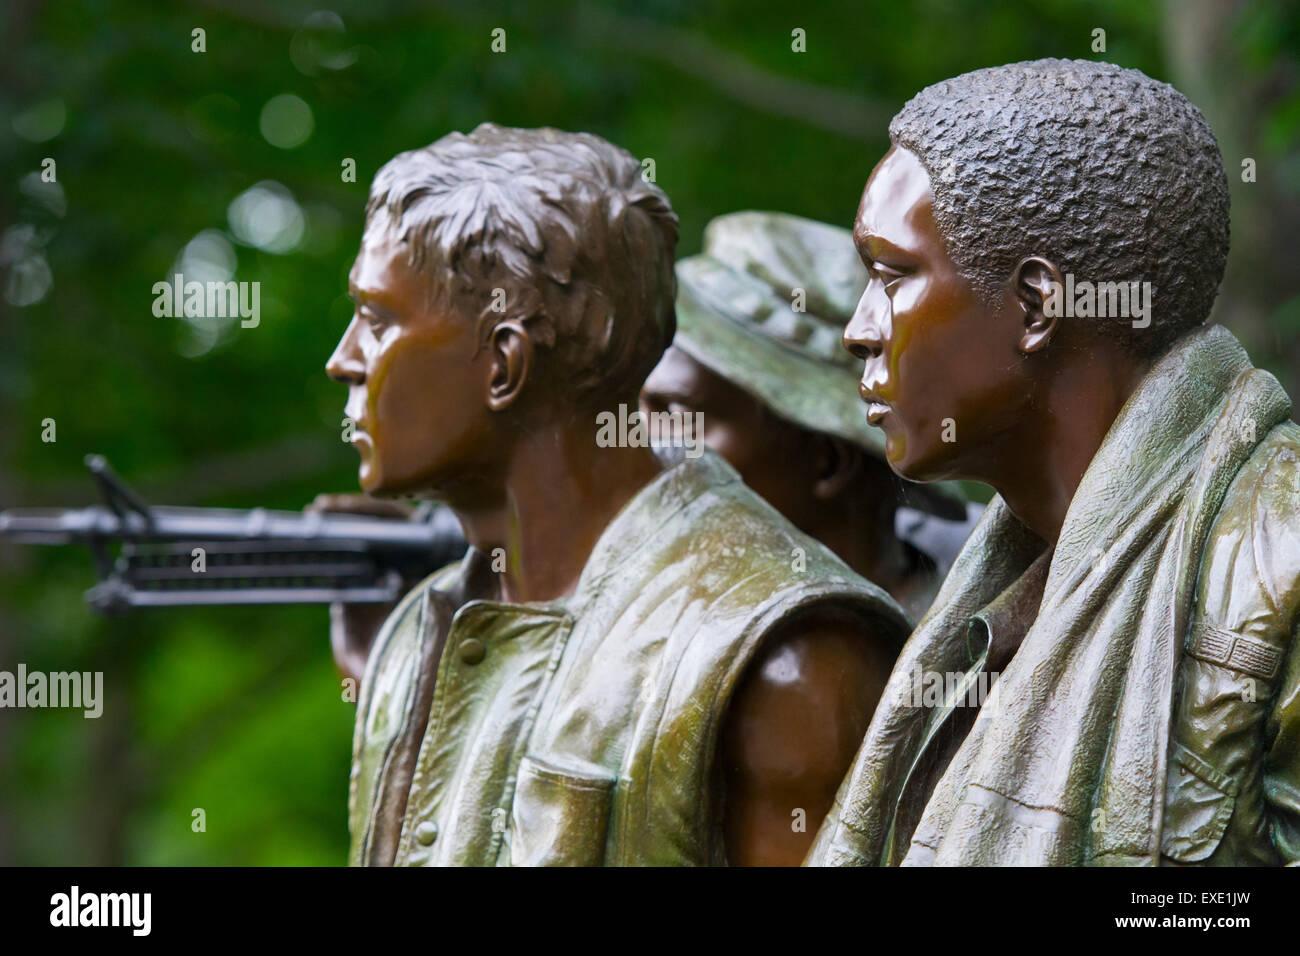 Vietnam War Veterans Memorial Statue, Three Servicemen, Washington DC - Stock Image